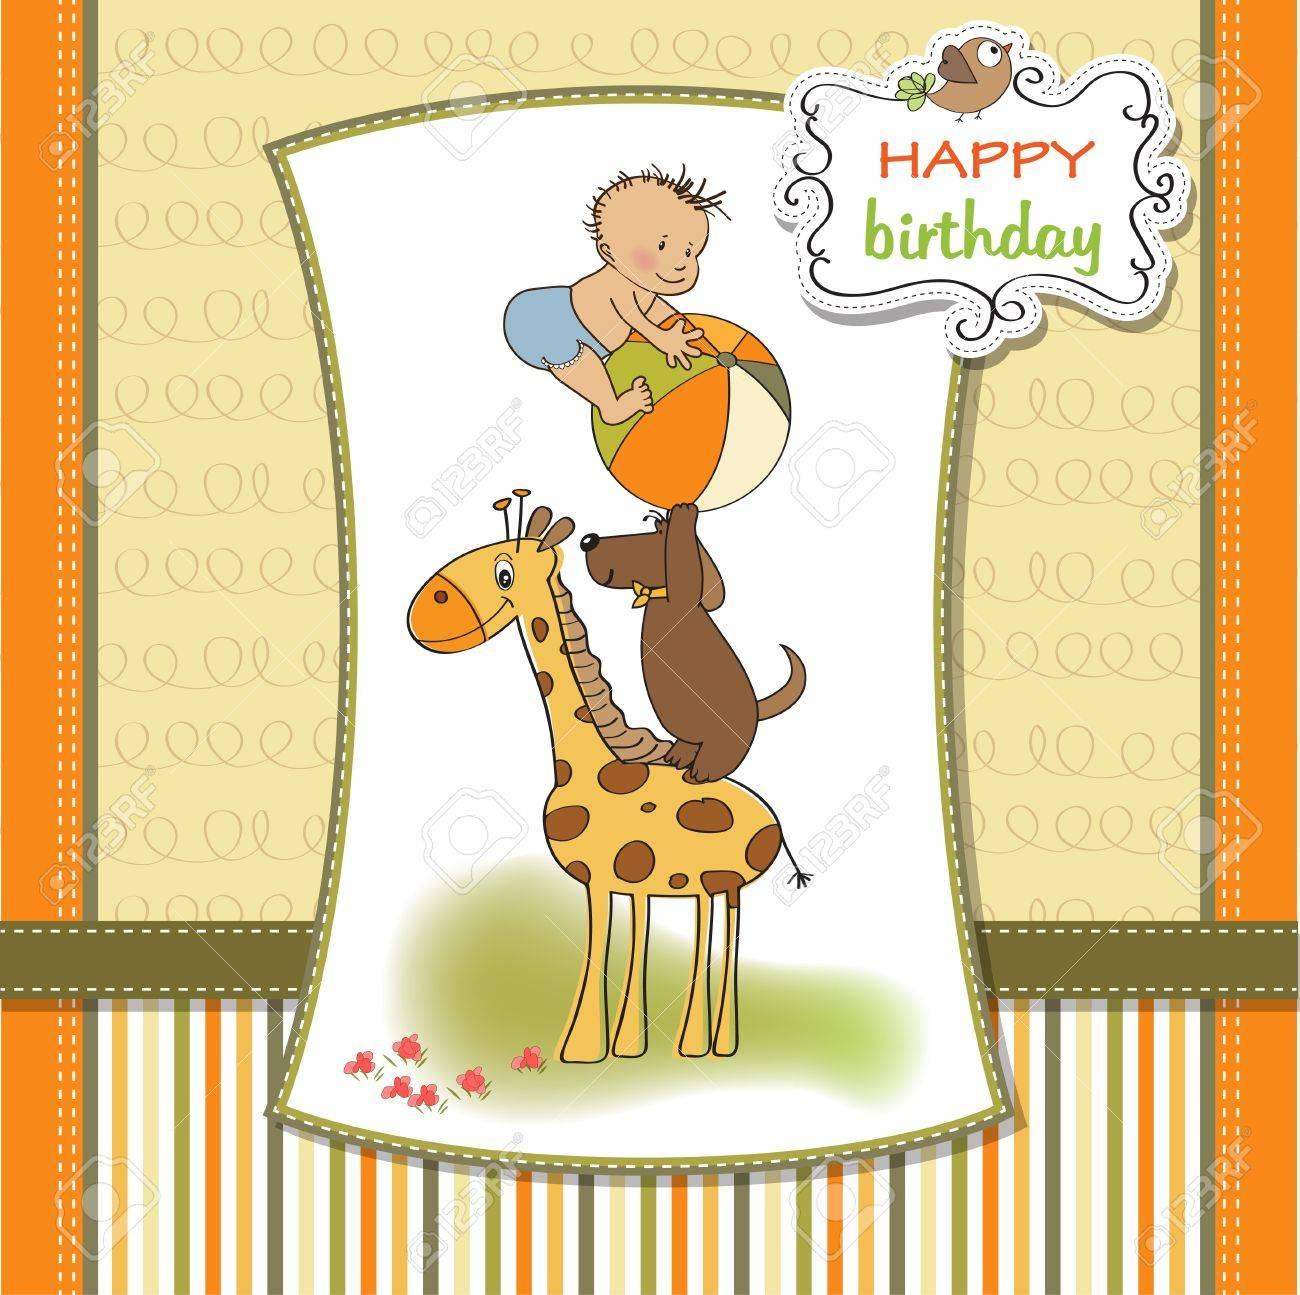 funny cartoon birthday greeting card Stock Vector - 12897251